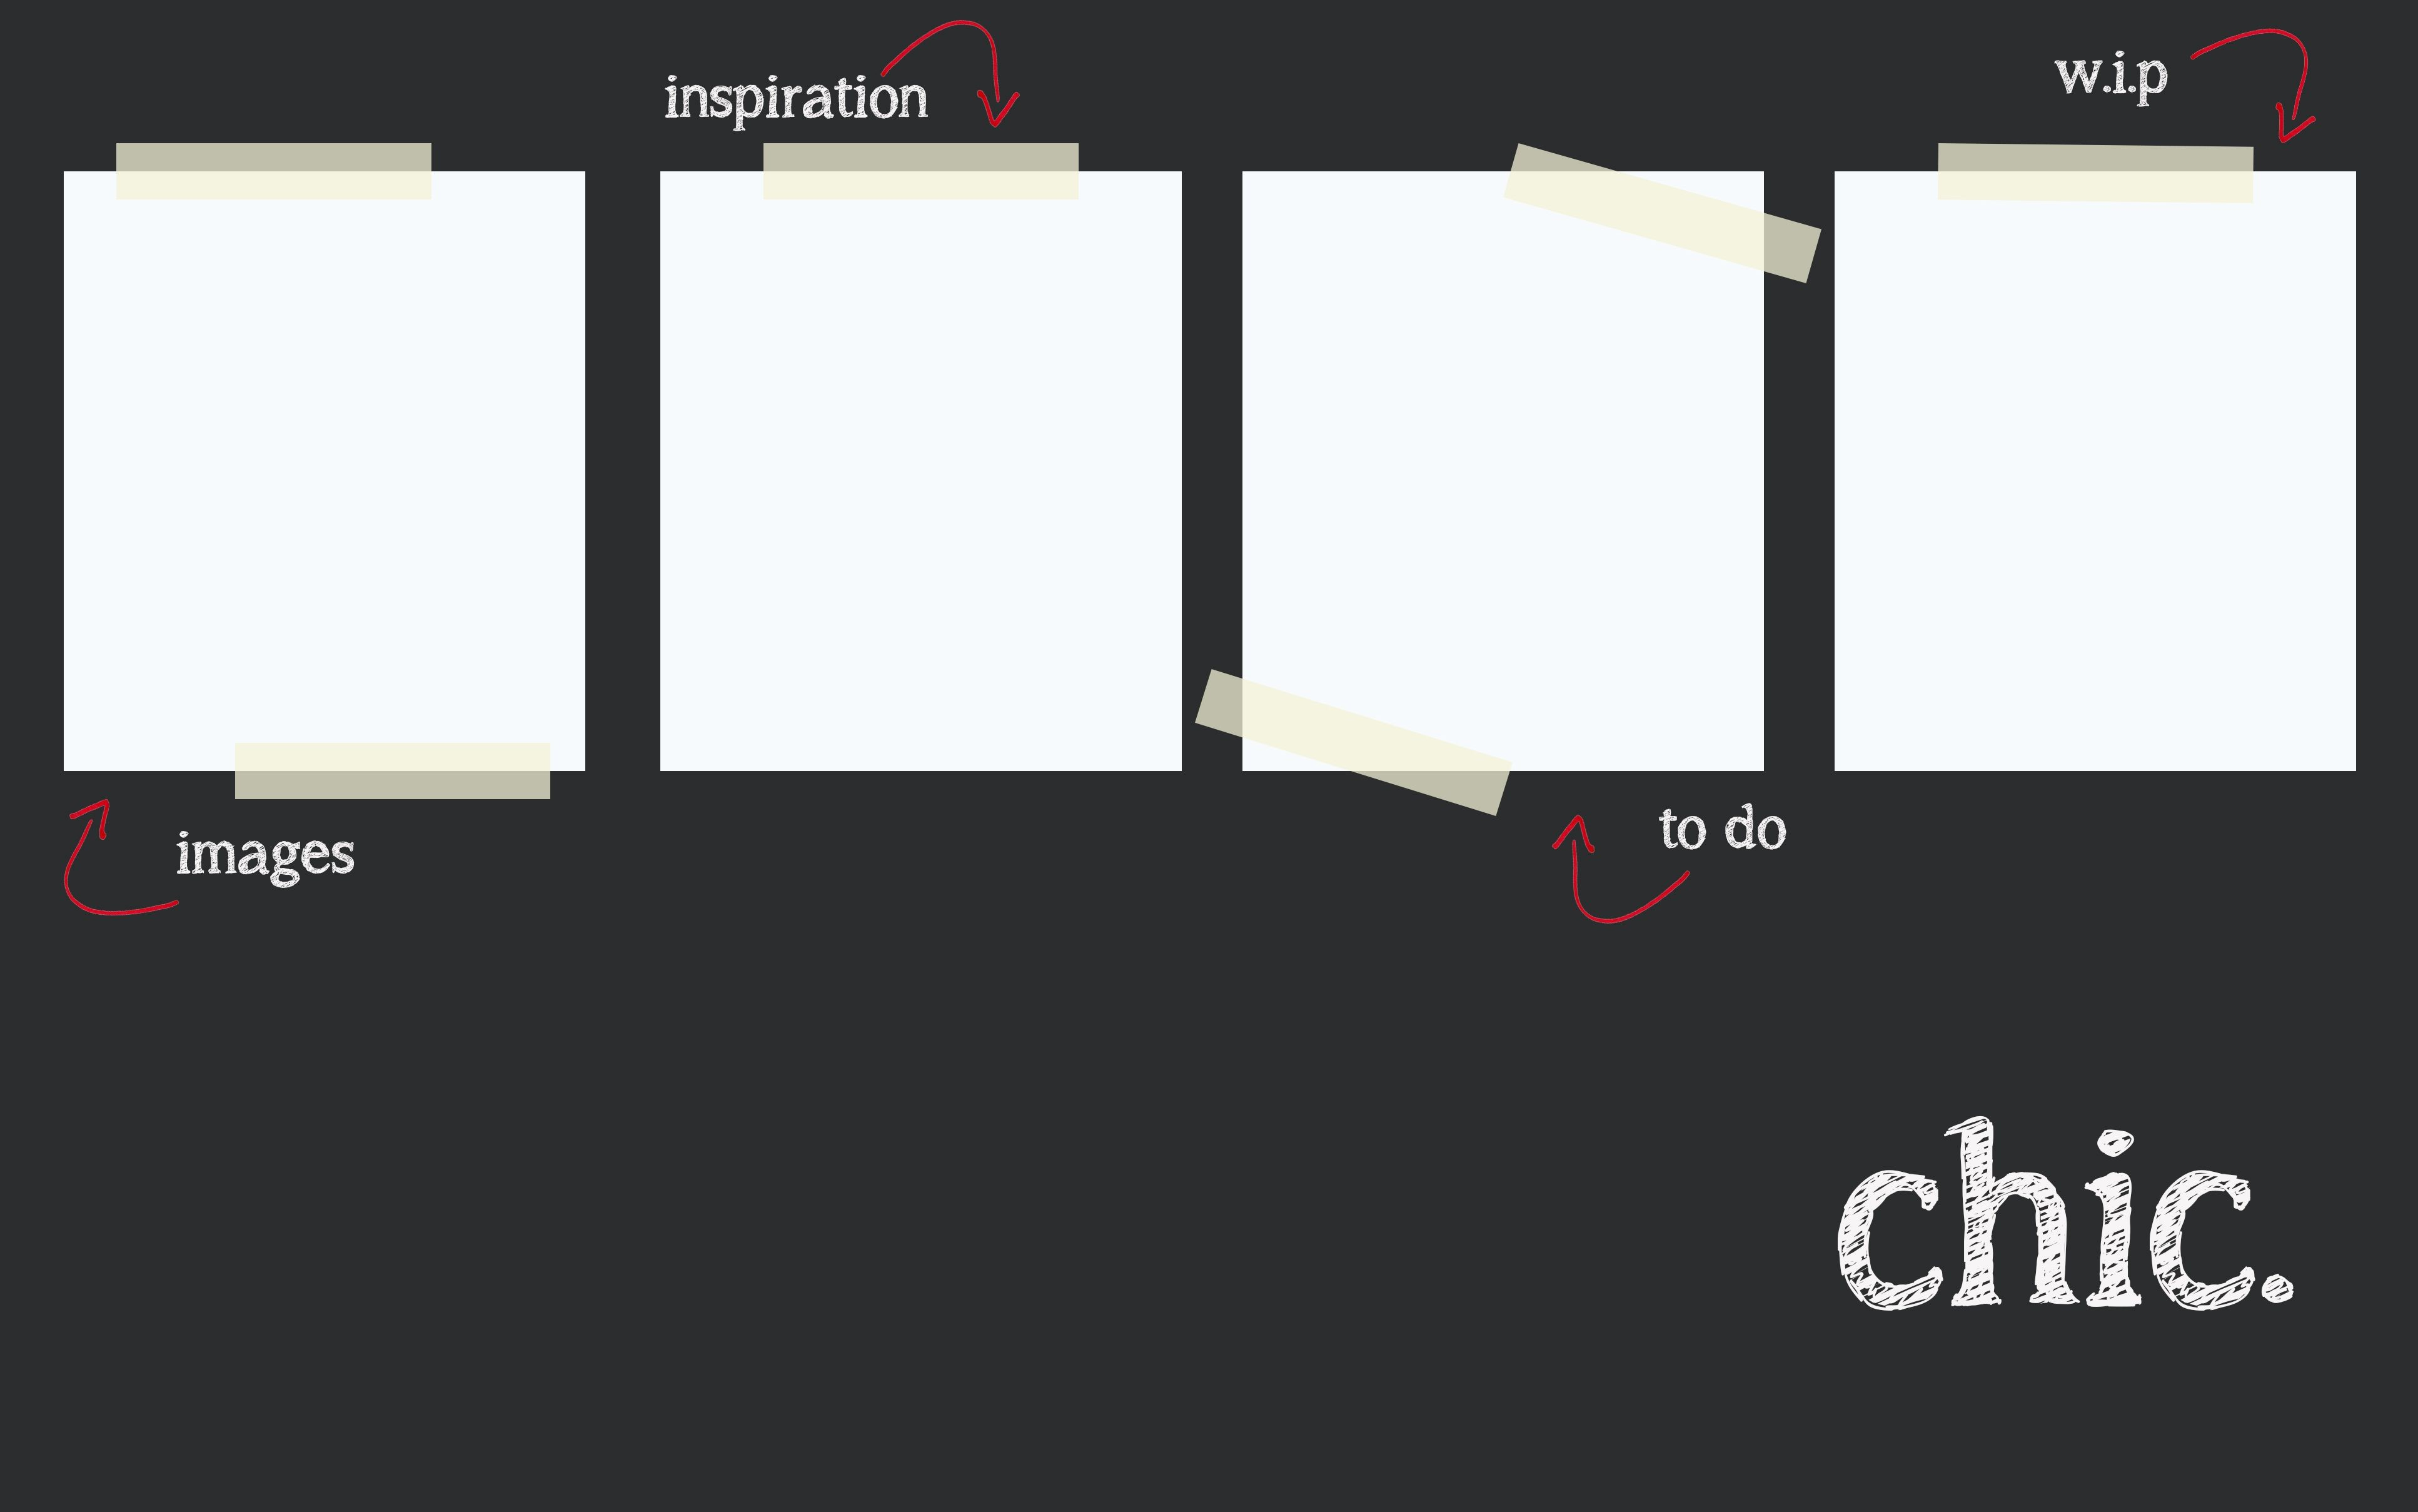 Chic Wallpaper Organization ideas